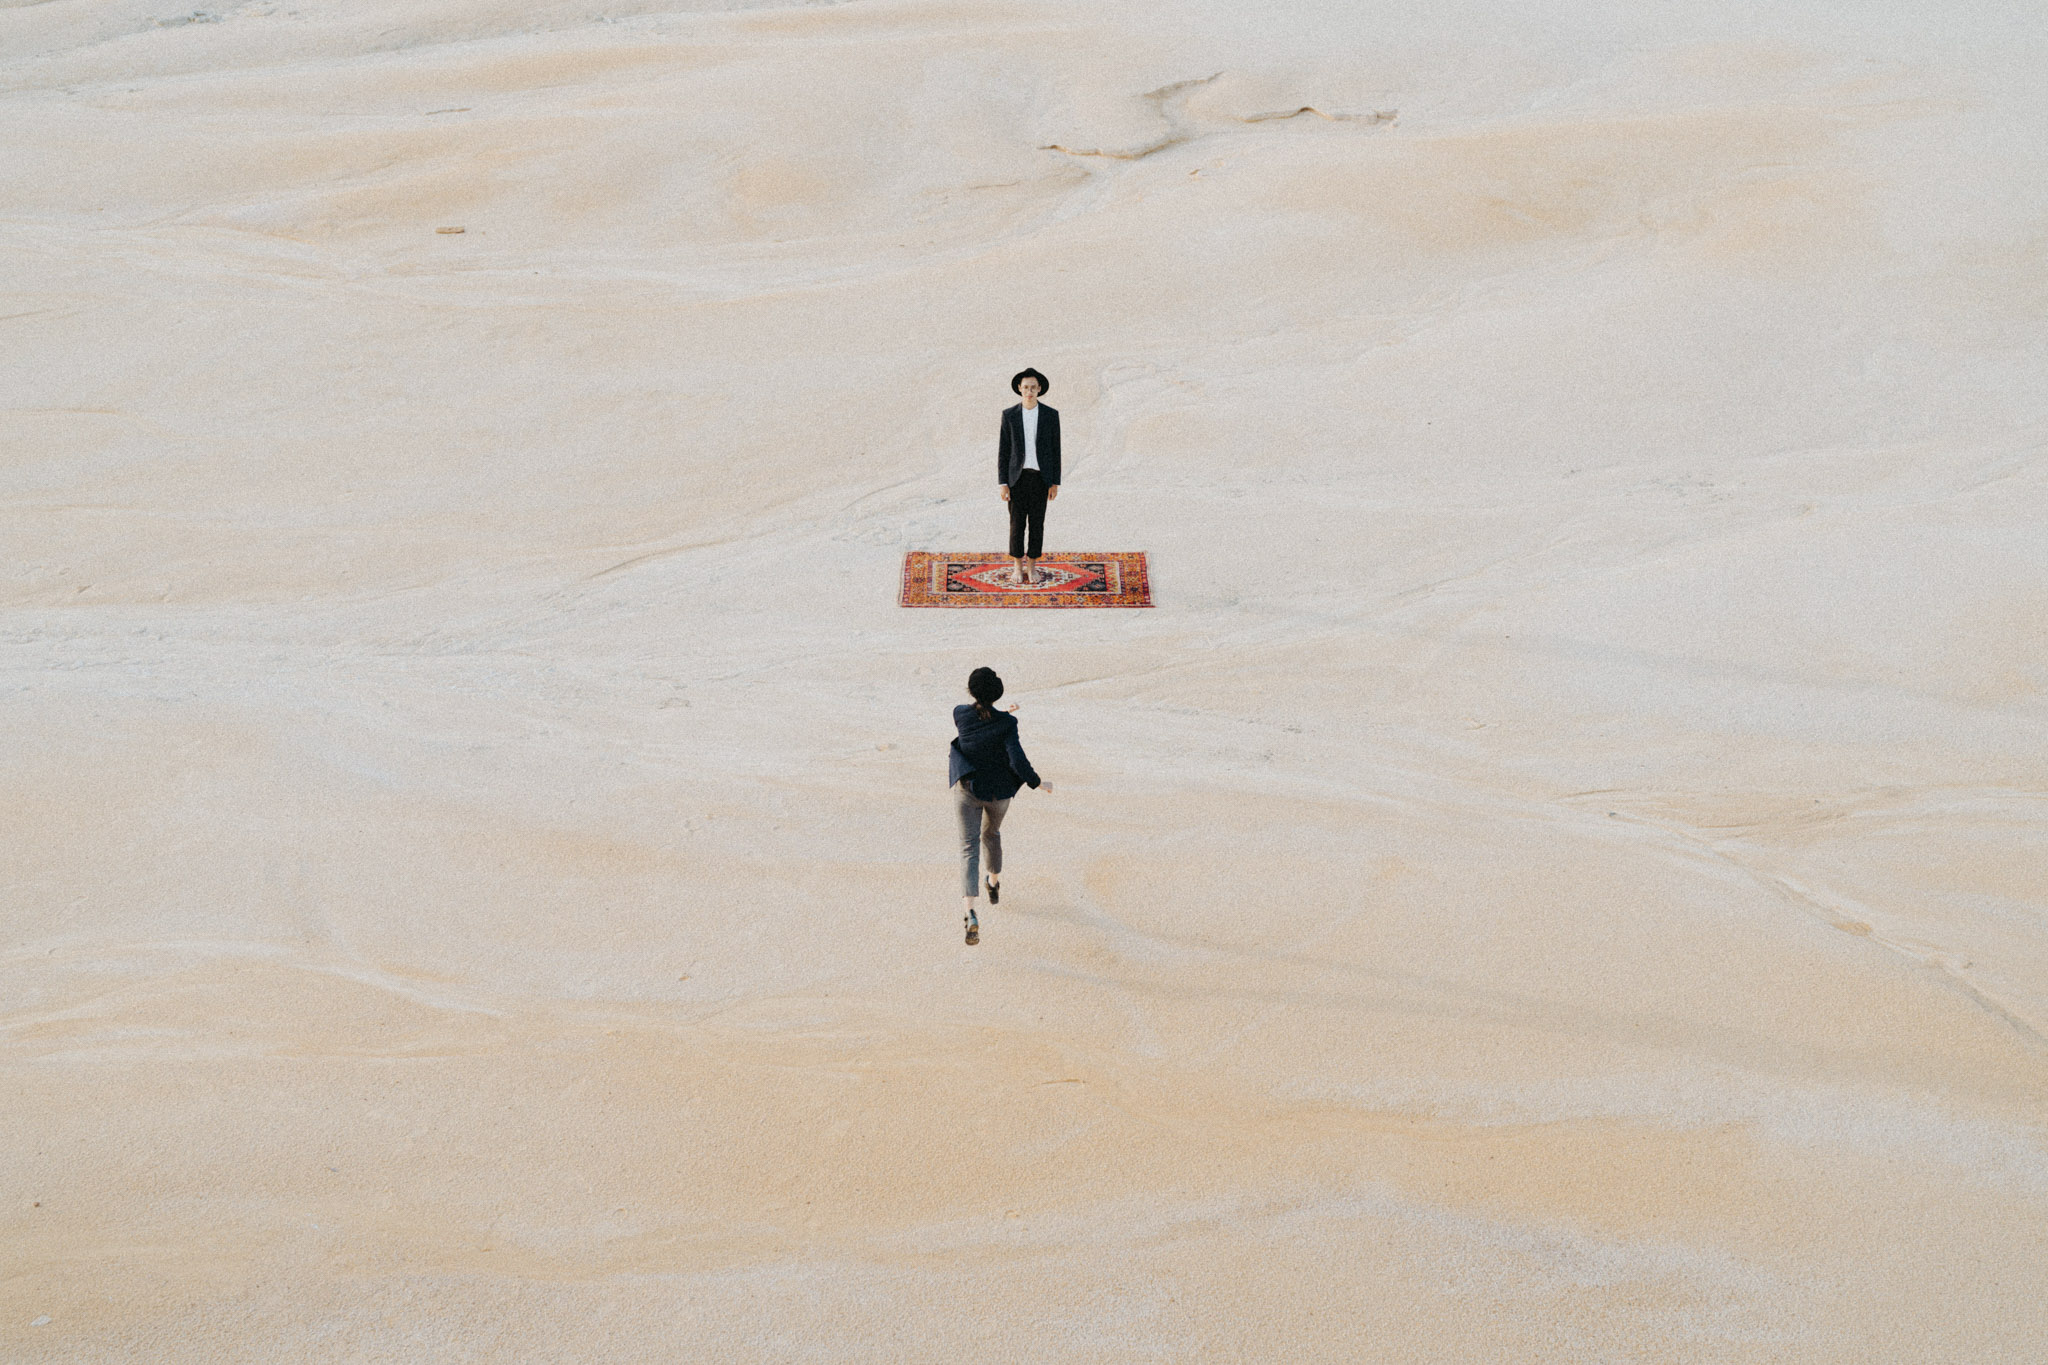 photo by Govinda Rumi / Terralogical